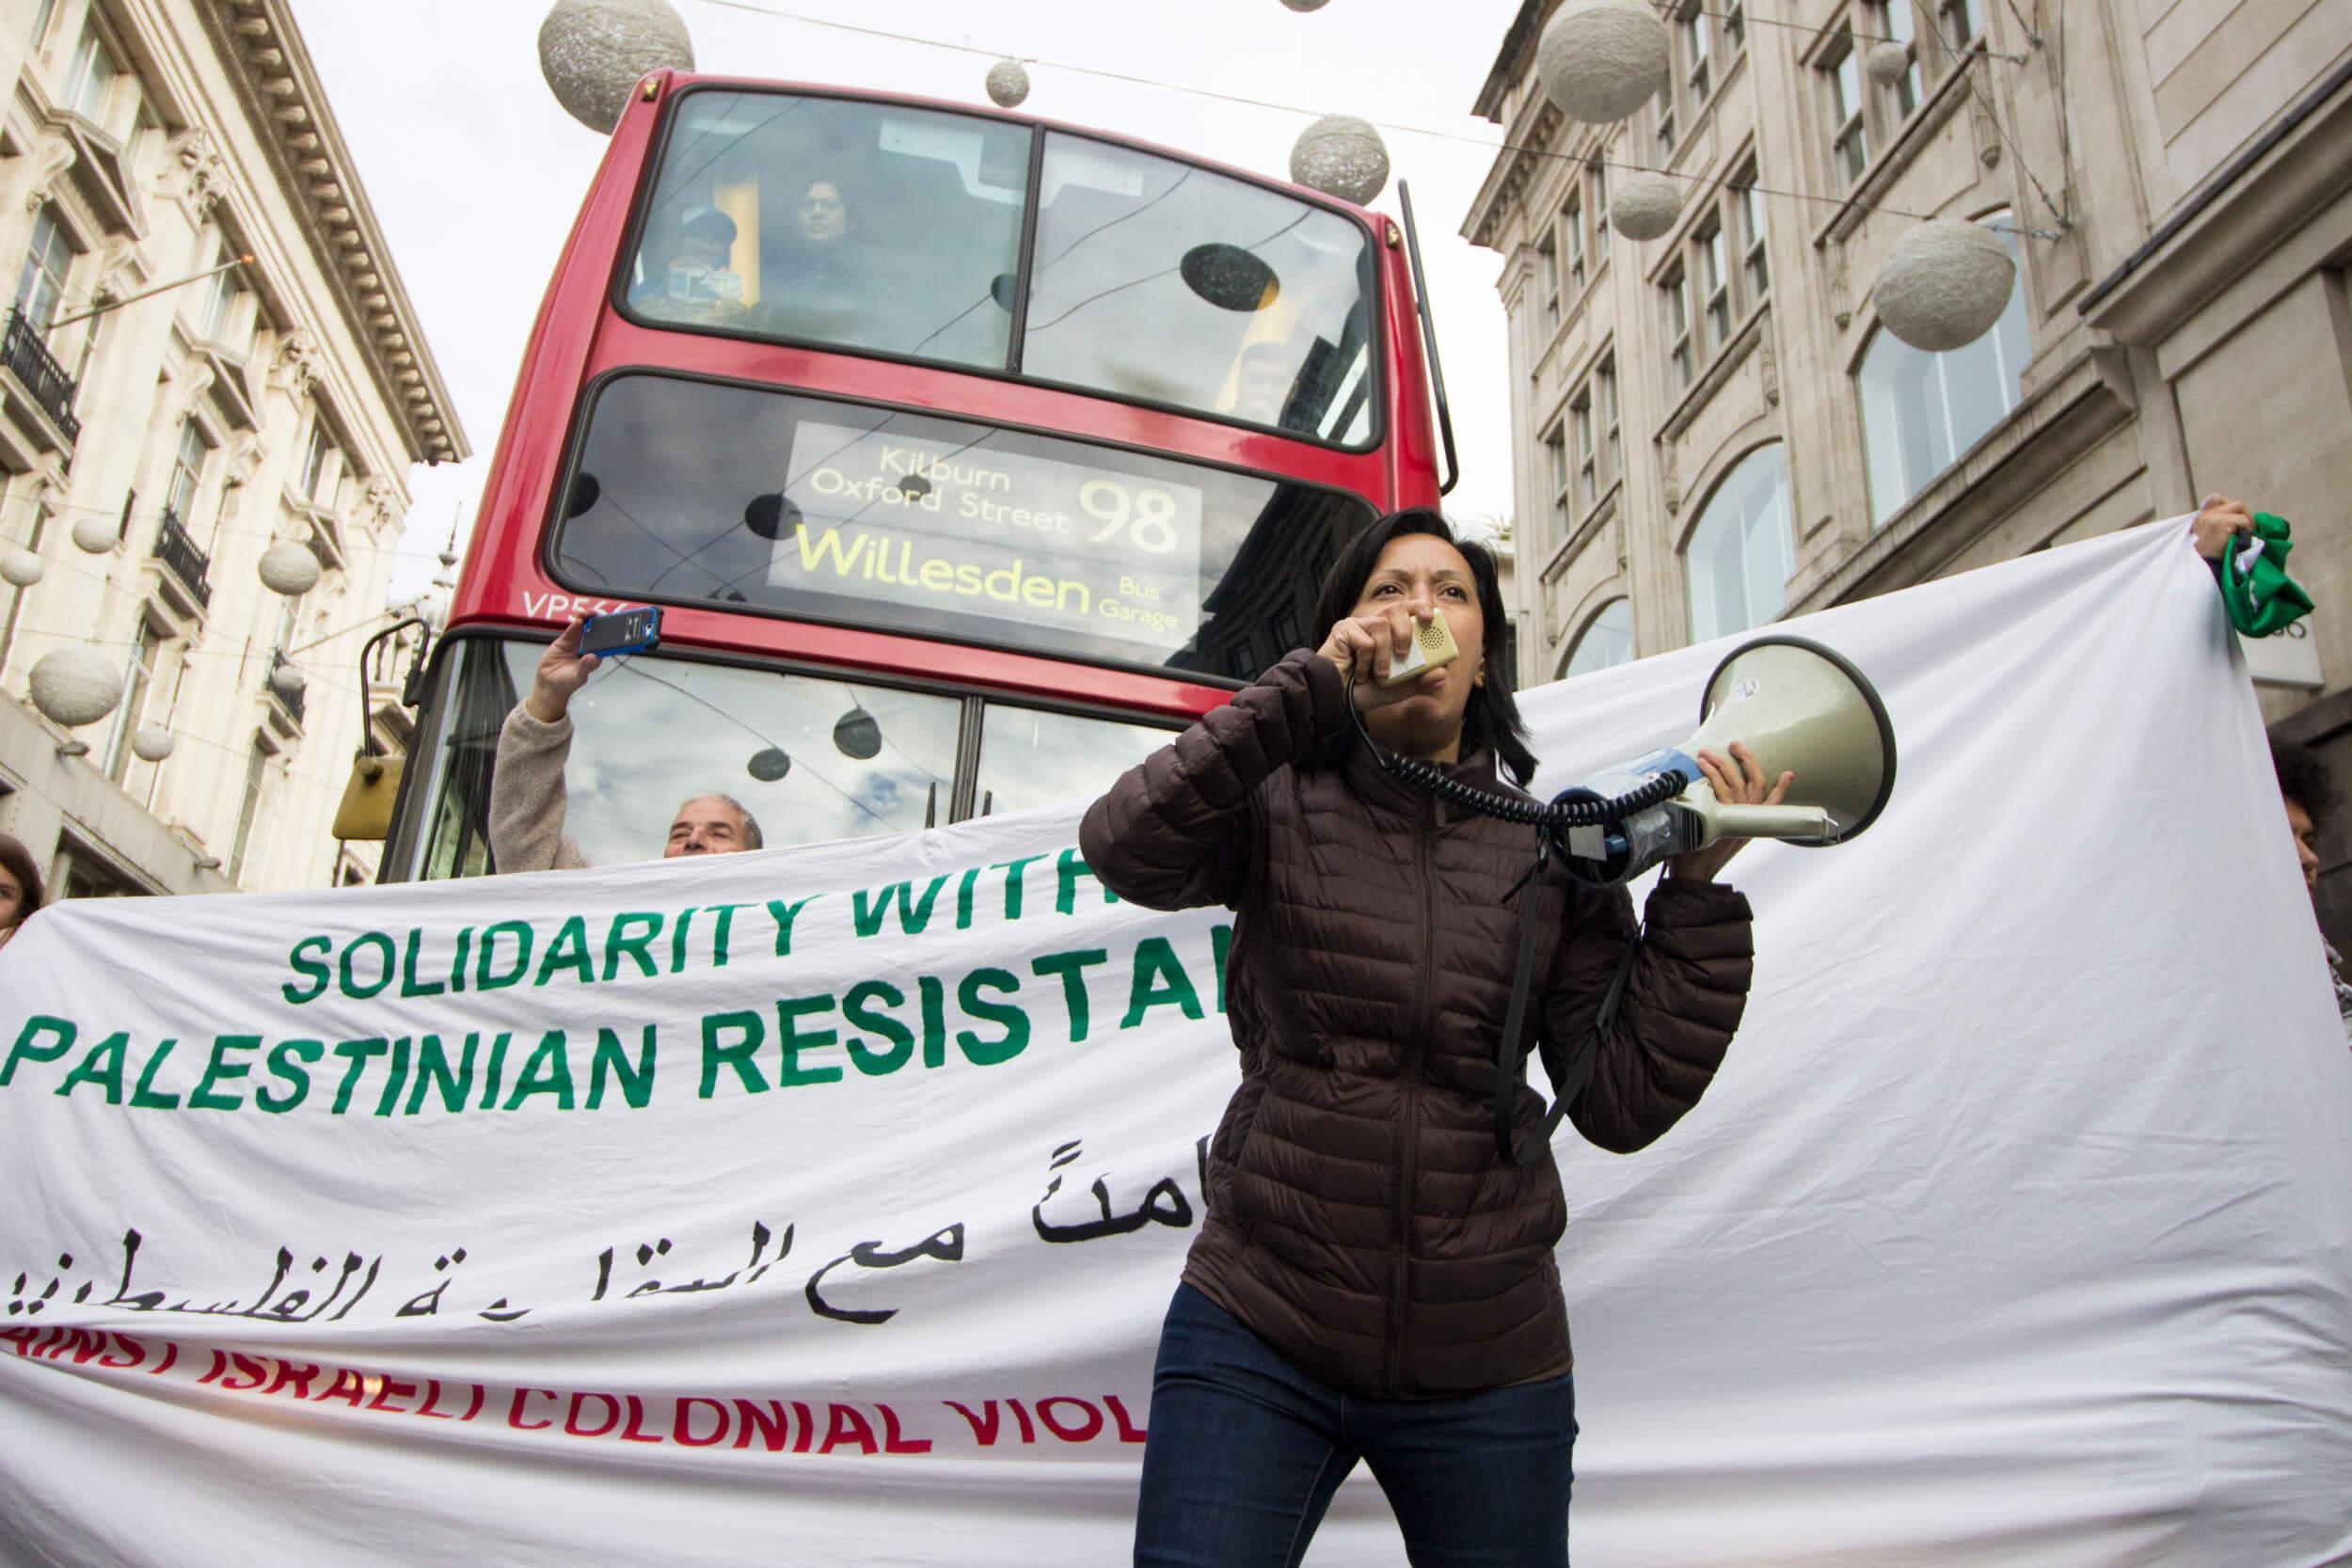 Palestinian artist and activist Rafeef Ziadah stops traffic on Oxford Street. (Photo: Sara Anna)